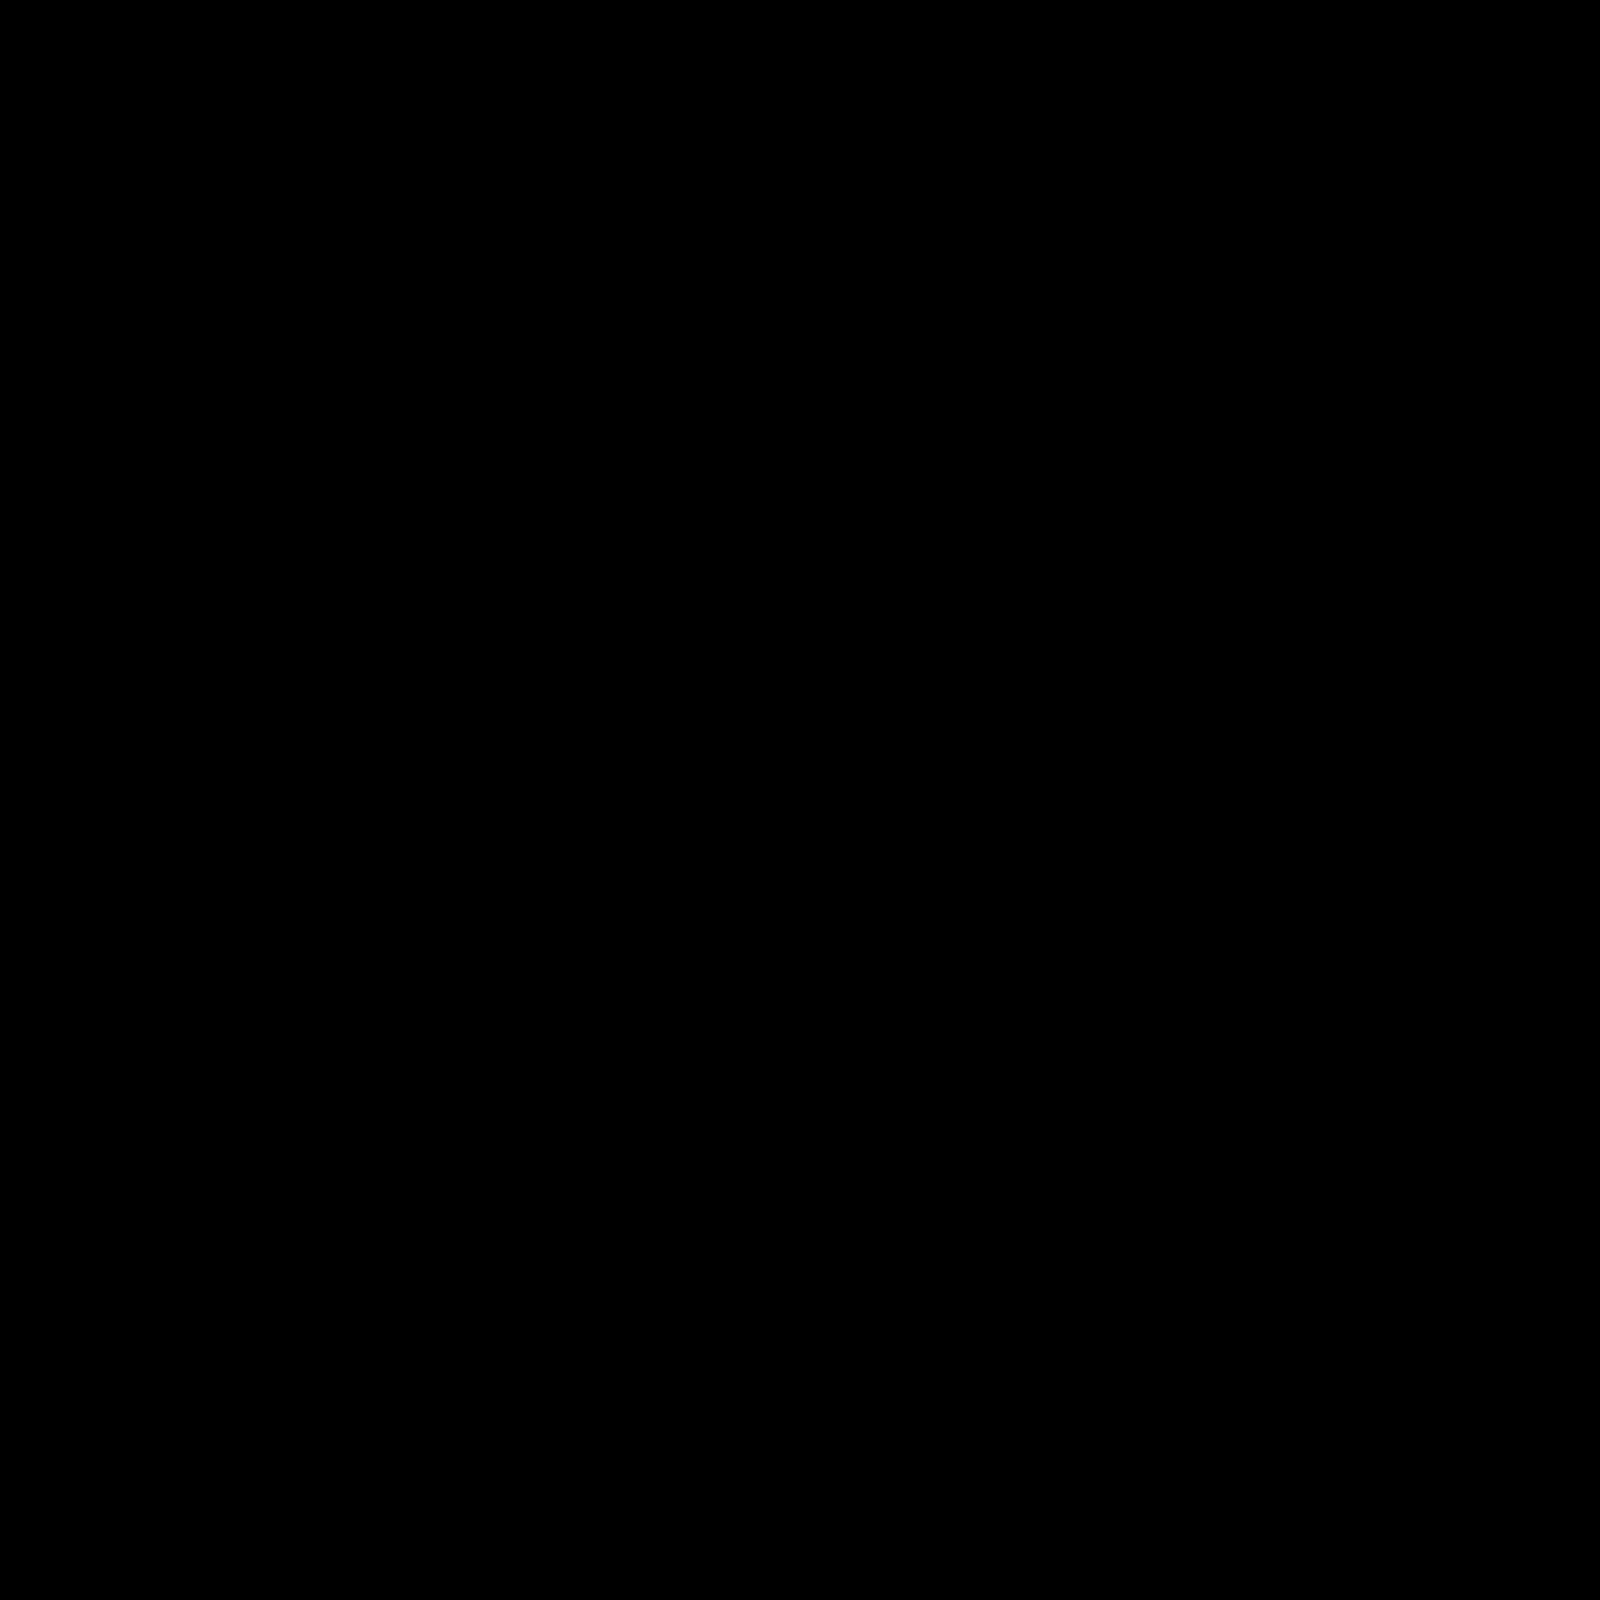 Tarcza icon